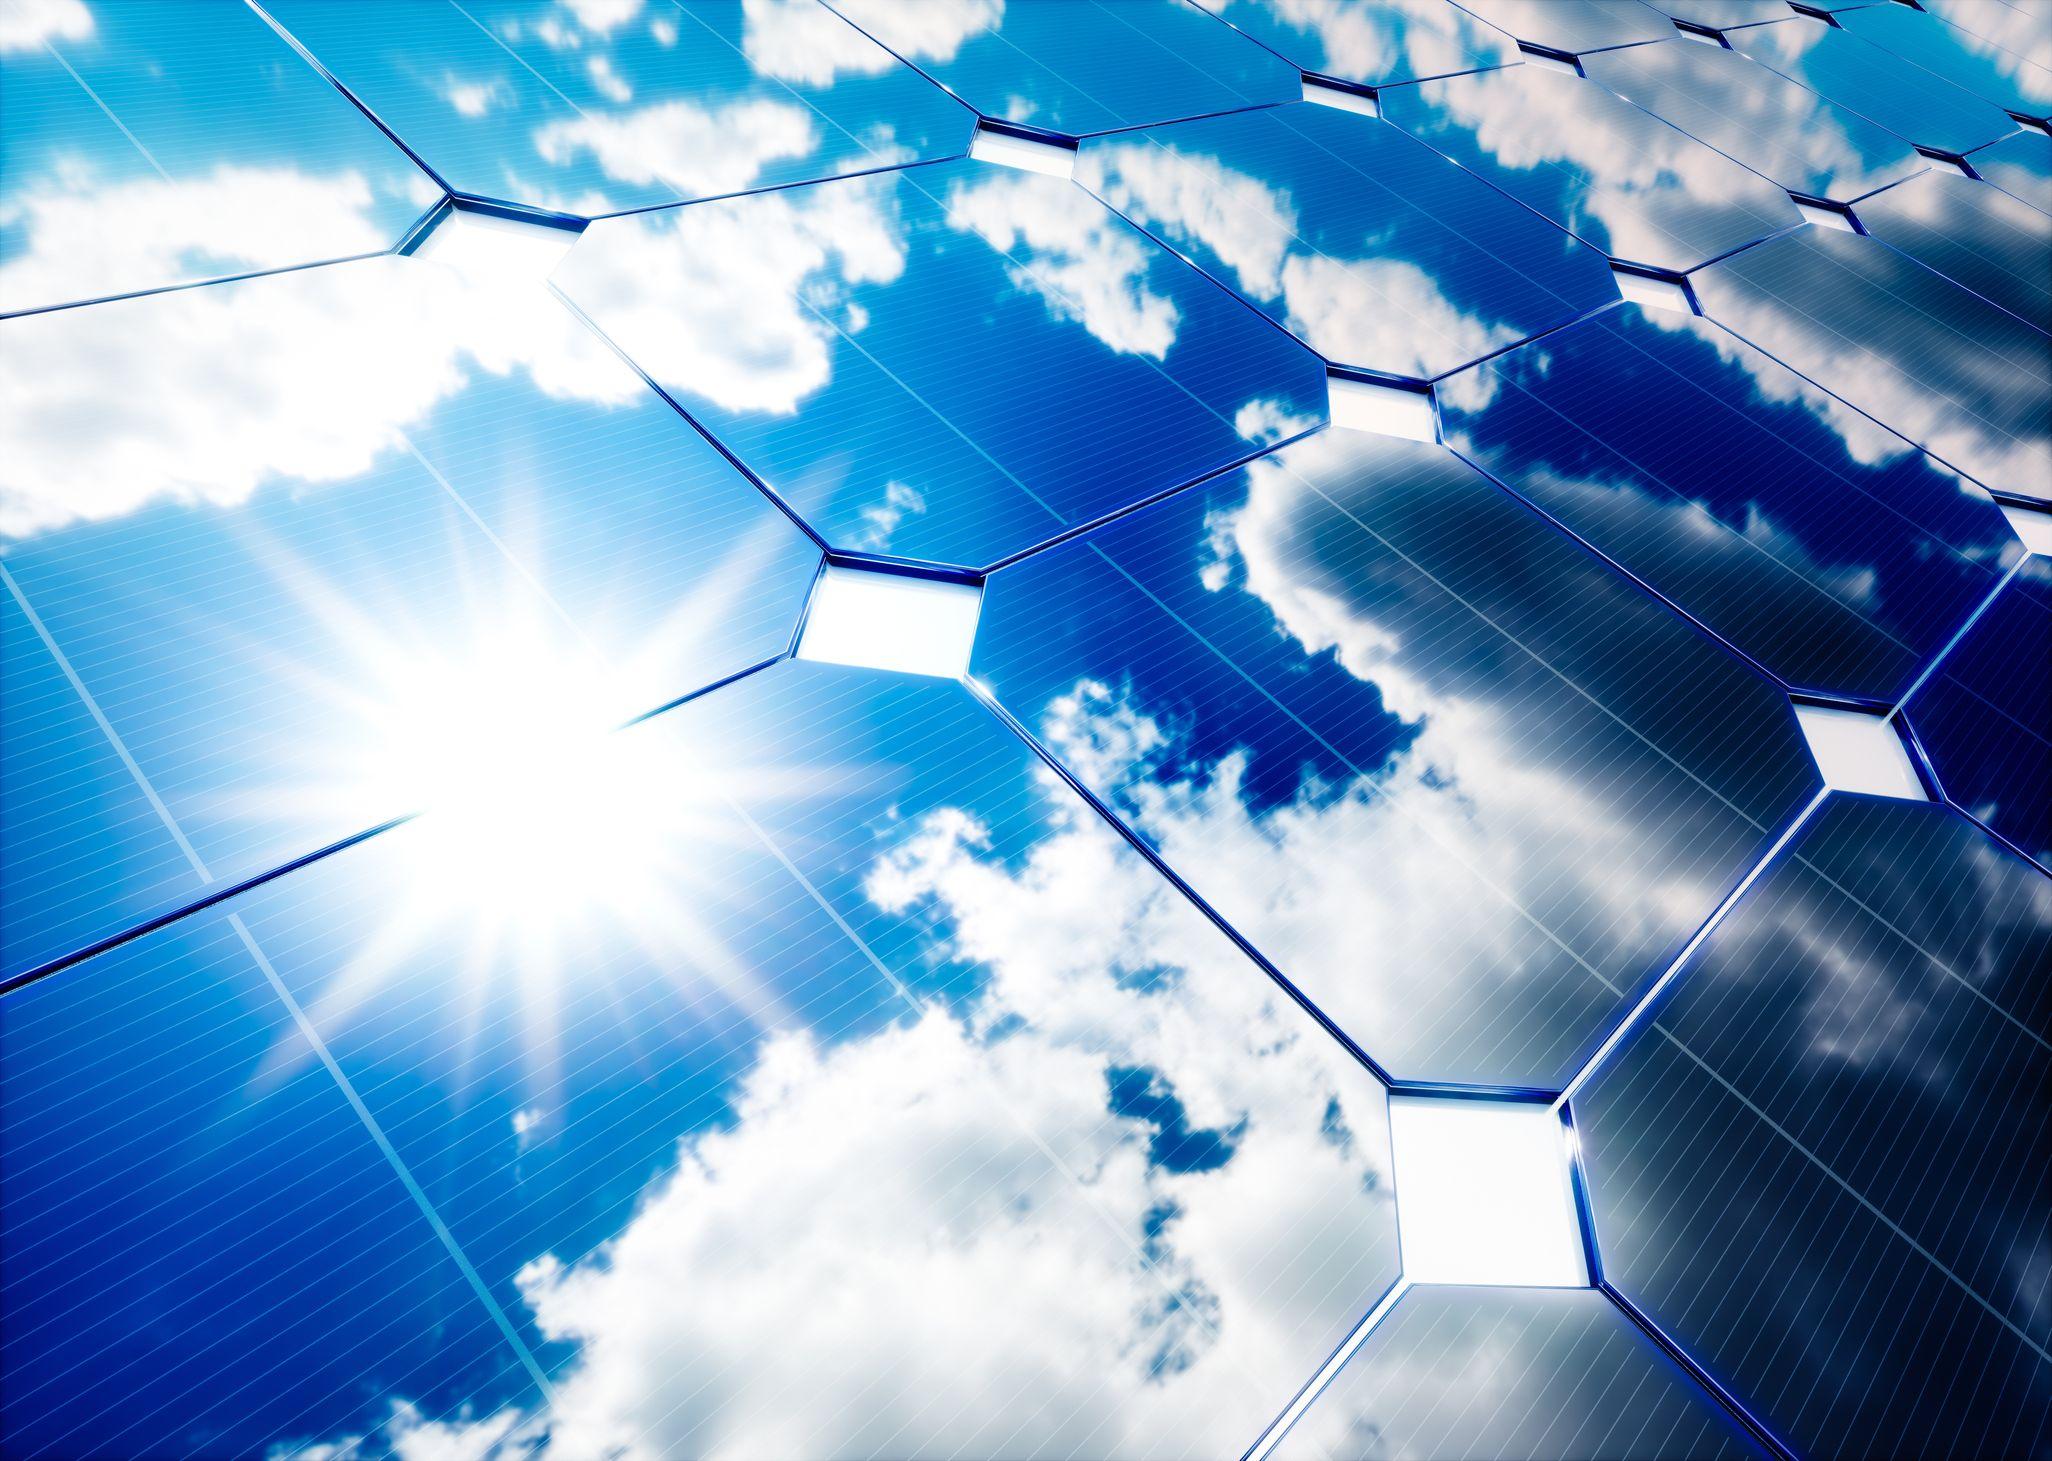 Instalación placas solares Zamora